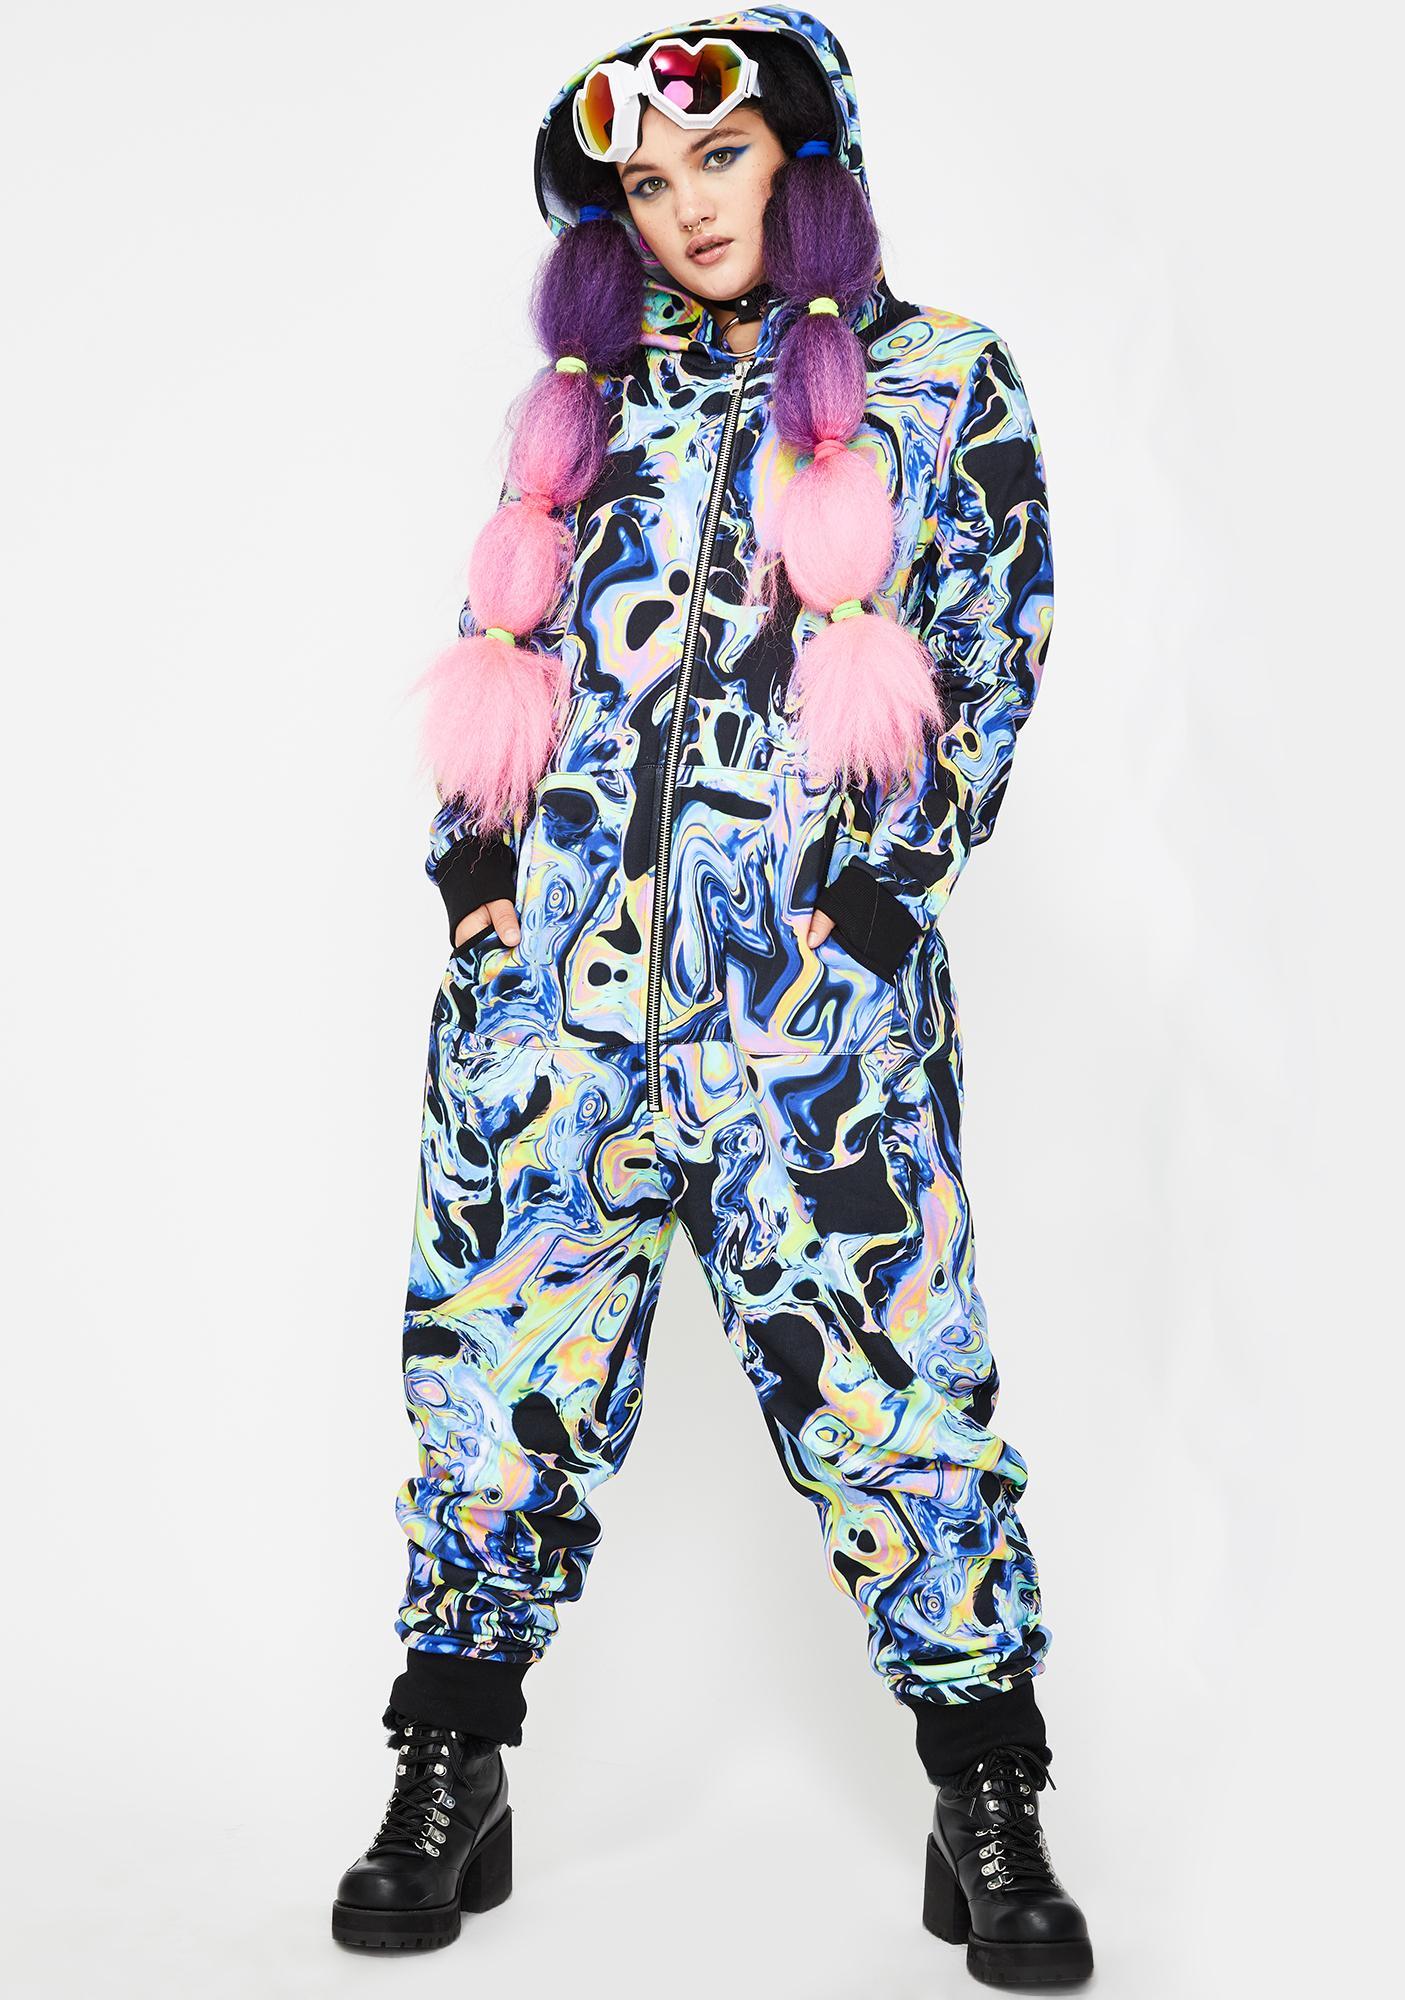 Club Exx Swirly Acid Dimension Hooded Onesie